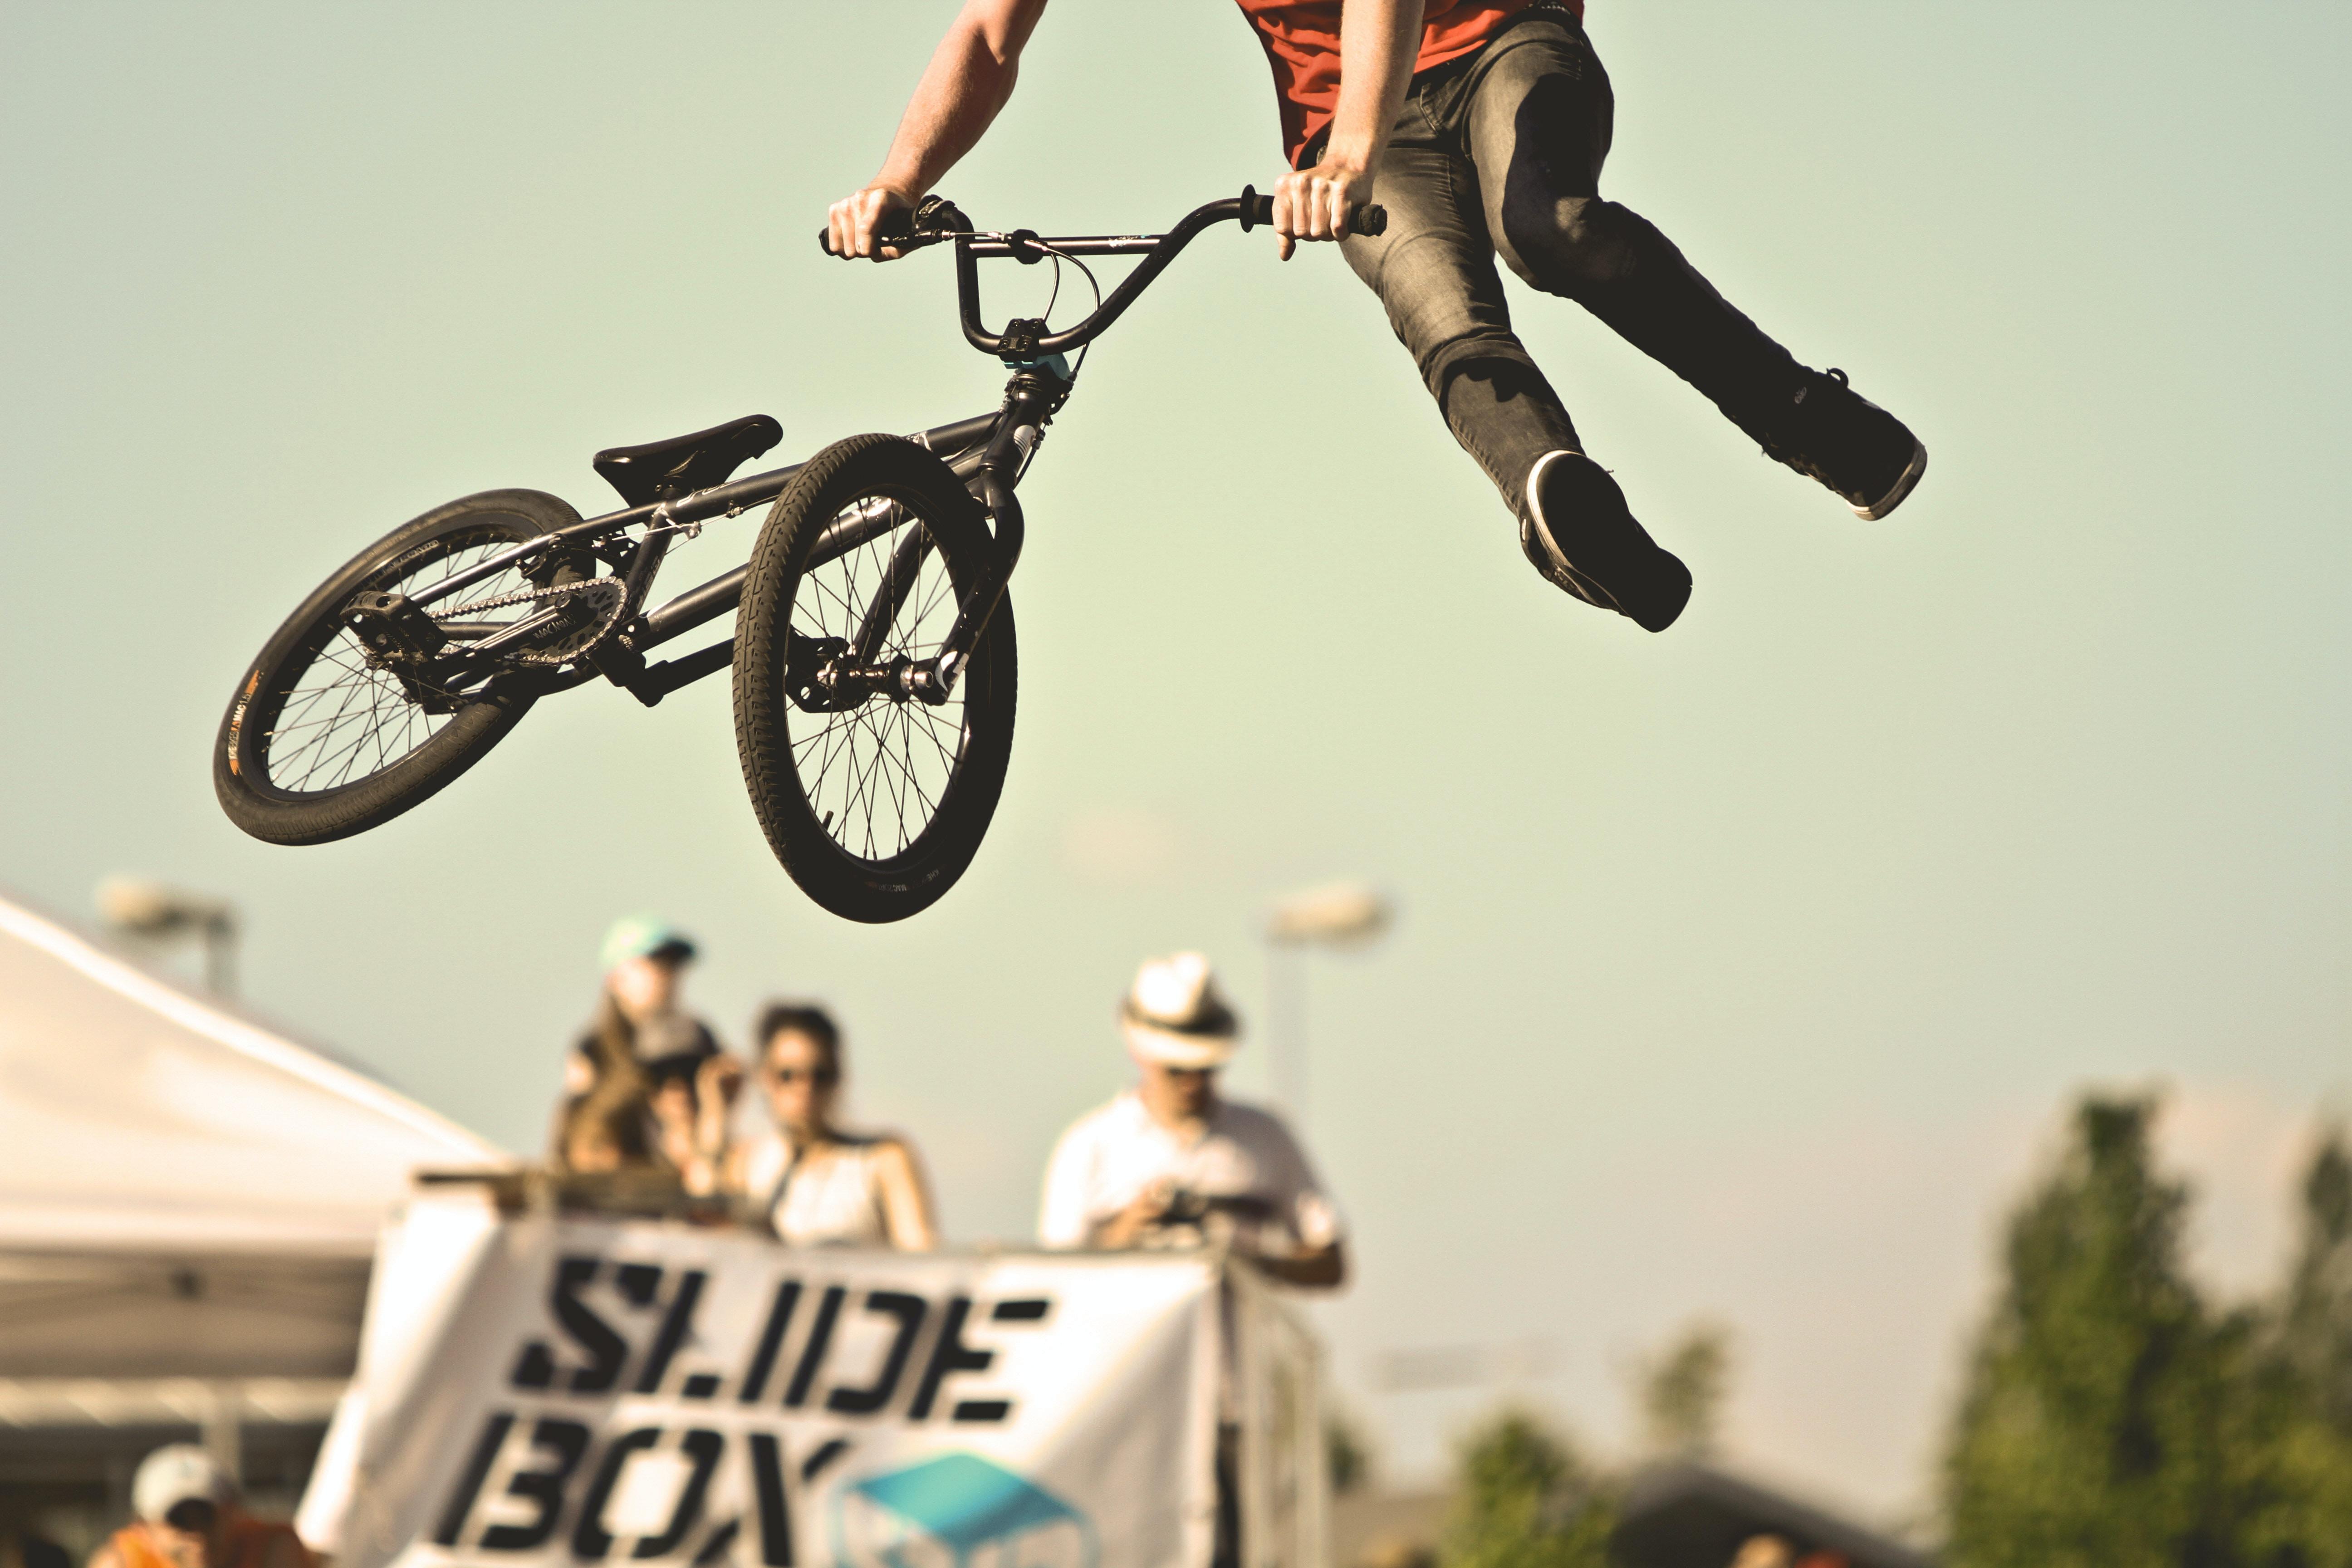 BMX Rider Silhouette UHD K Wallpaper Pixelz